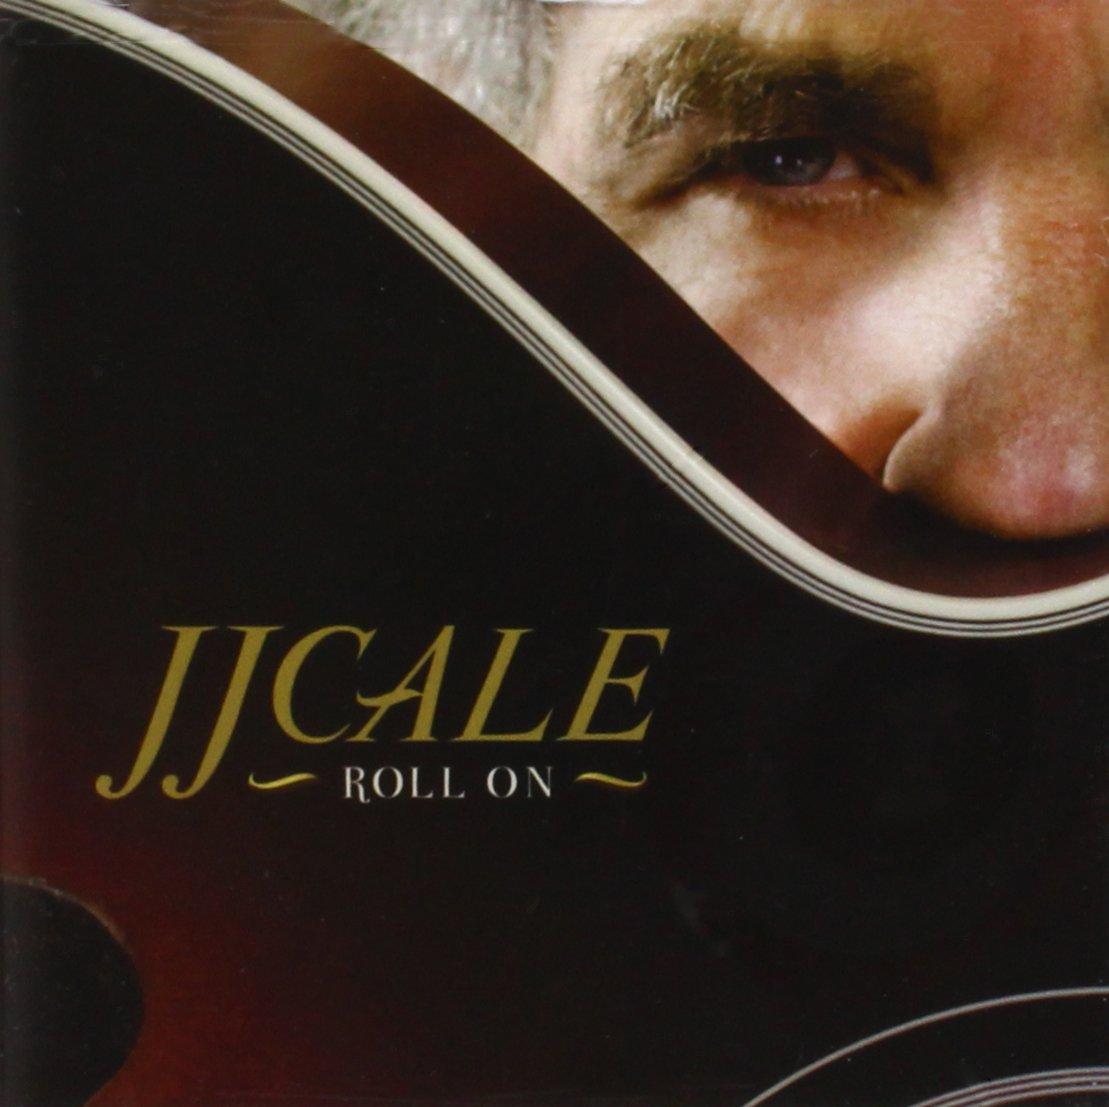 CD Shop - CALE J.J. ROLL ON